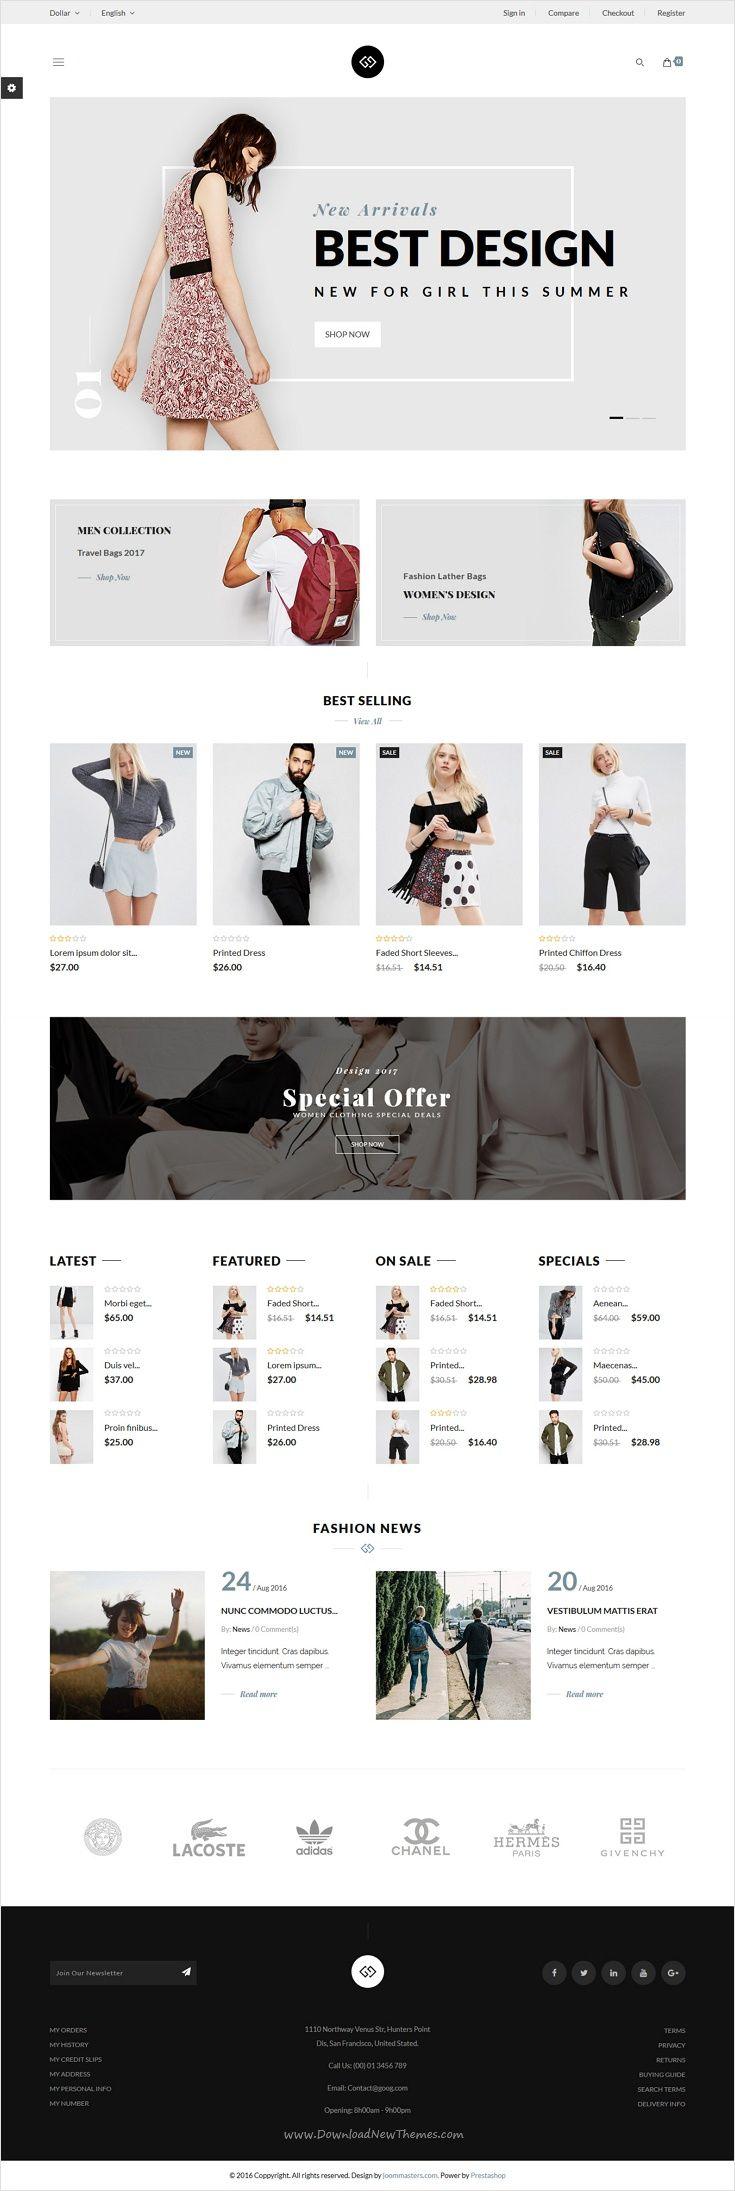 JMS GooG is the premium #Prestashop theme for fashion shop, clothes, shoes and #accessories store #website with 7+ unique homepage layouts download now➩ https://themeforest.net/item/jms-goog-responsive-prestashop-theme/18451536?ref=Datasata